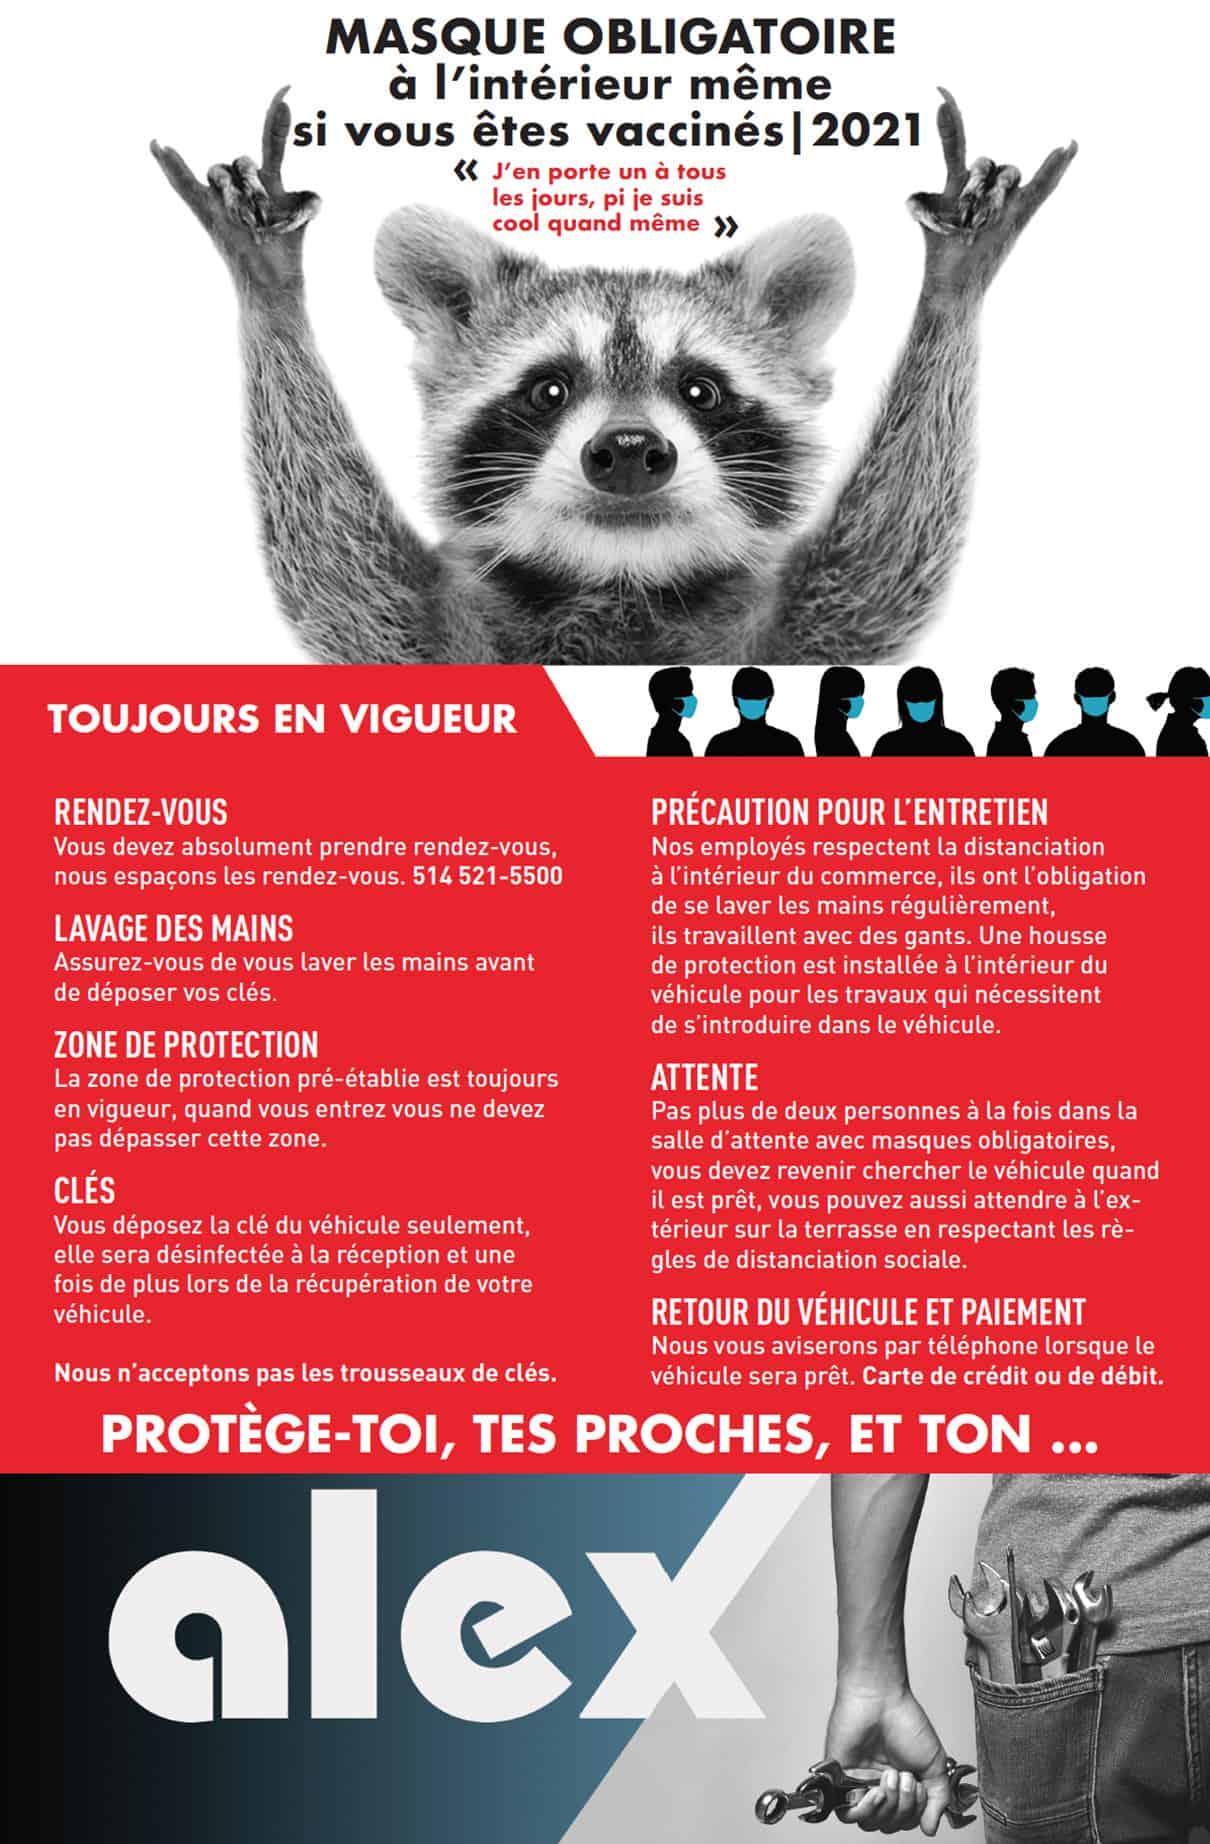 masque2021a copy 1